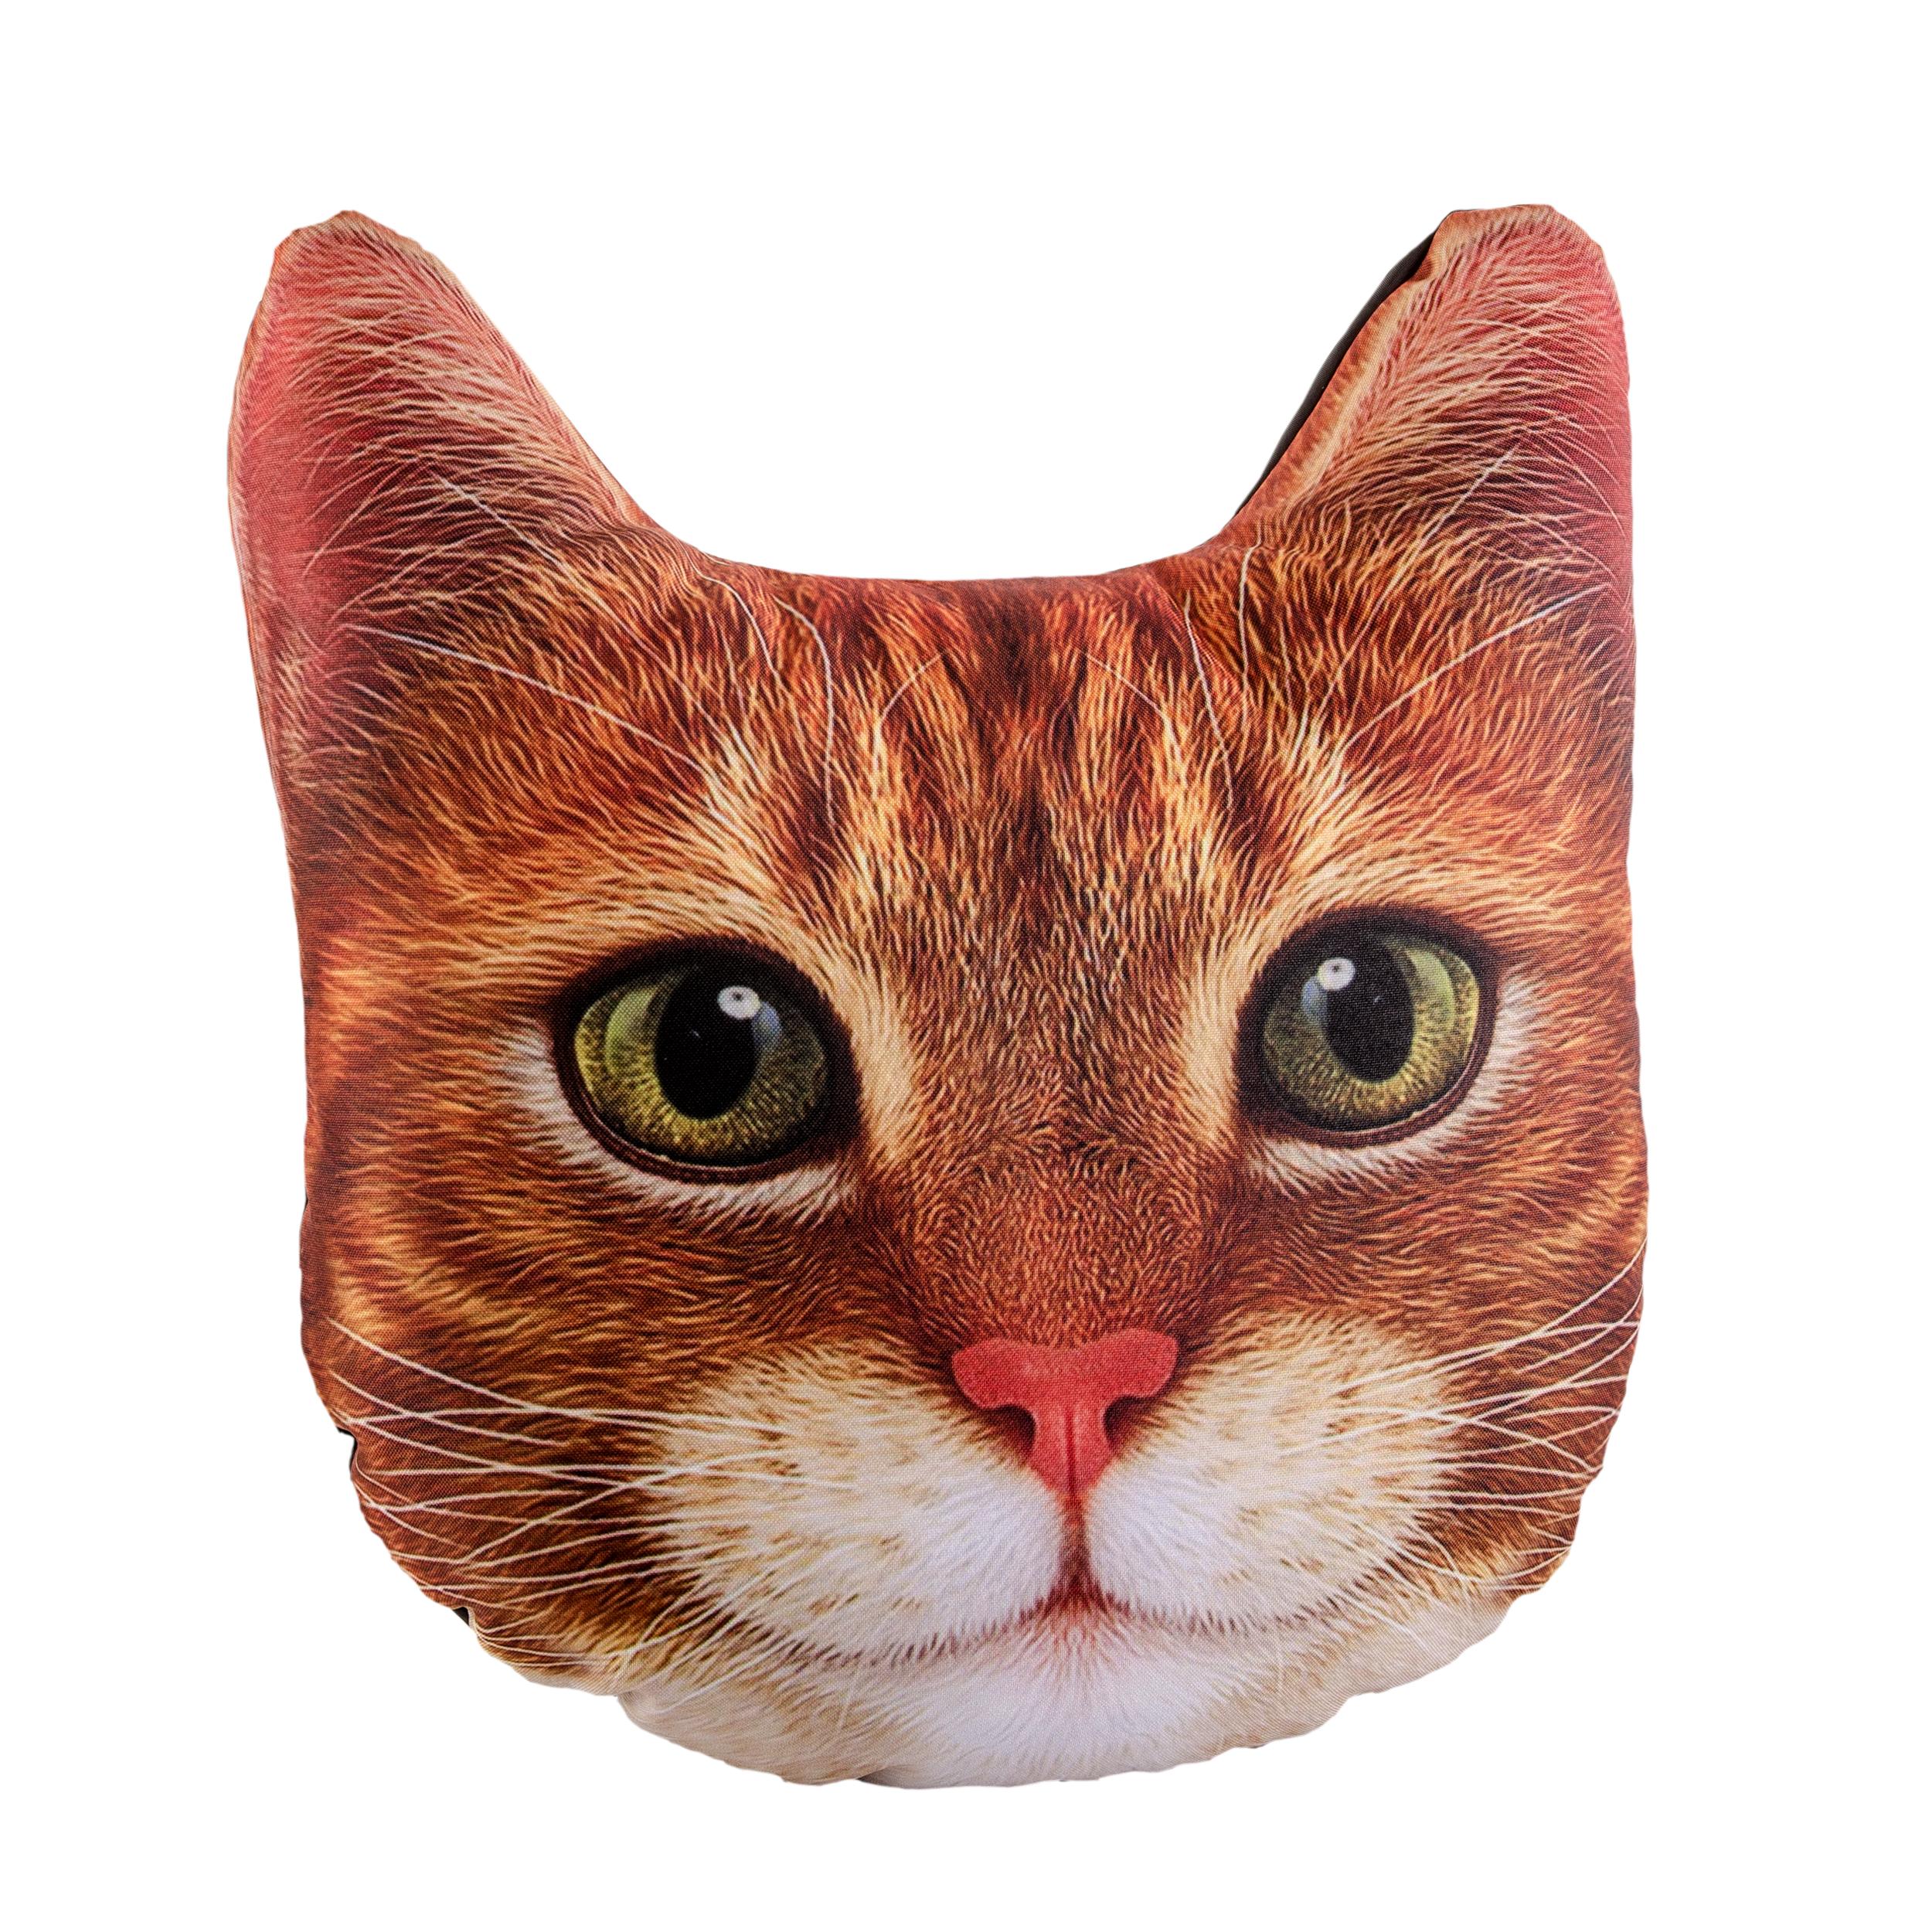 Подушка на сиденье GiftnHome сиденье, Auto-FACE Рыжий кот